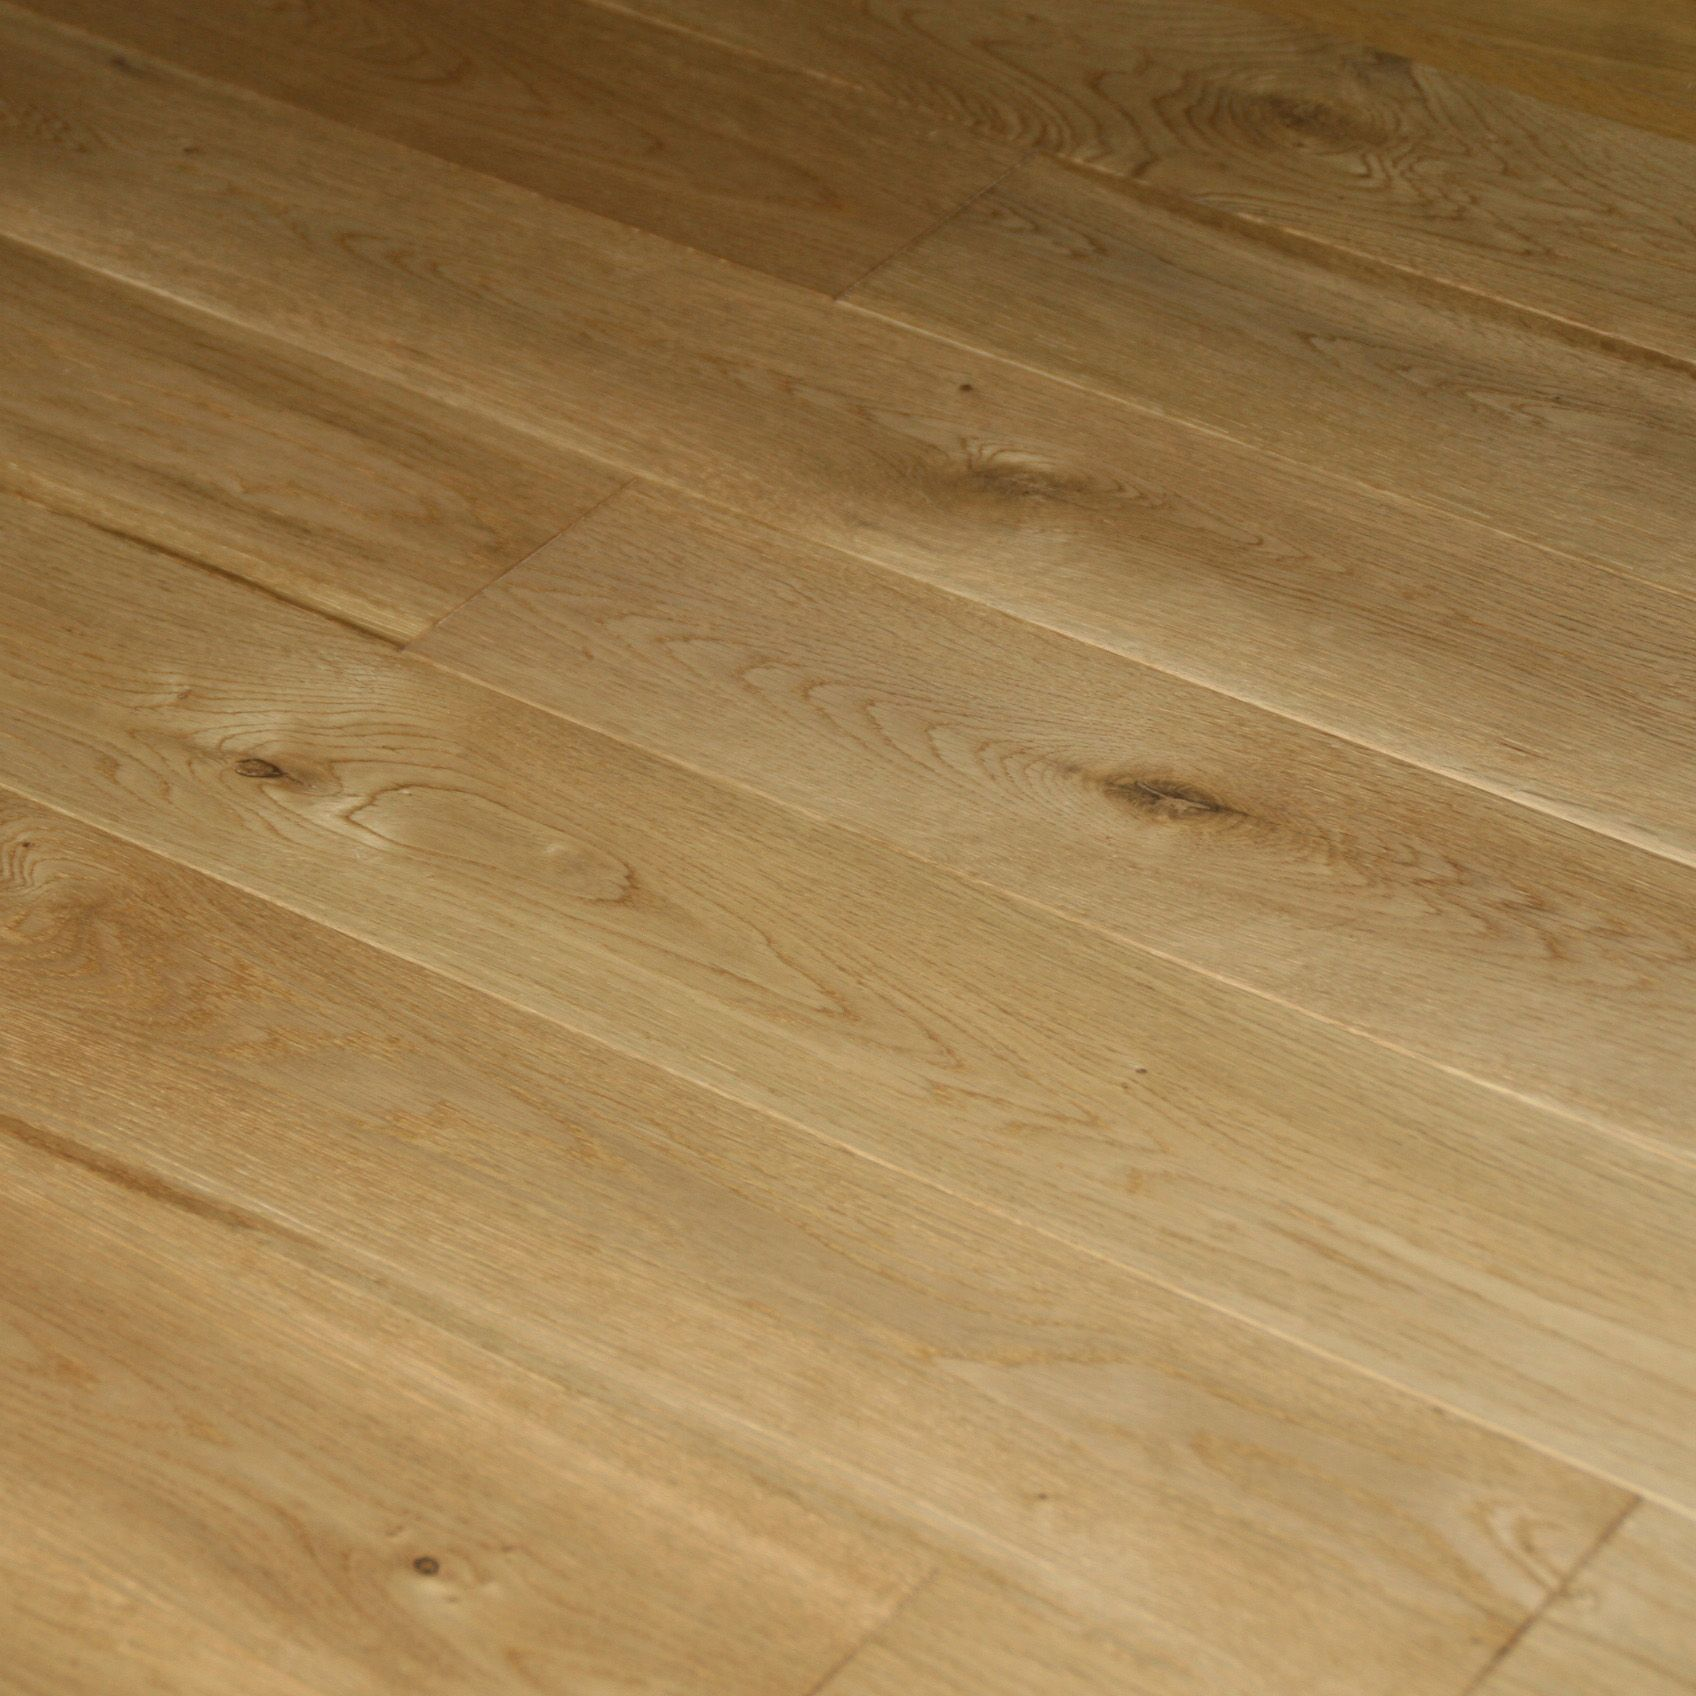 Diy at b q for Natura oak flooring